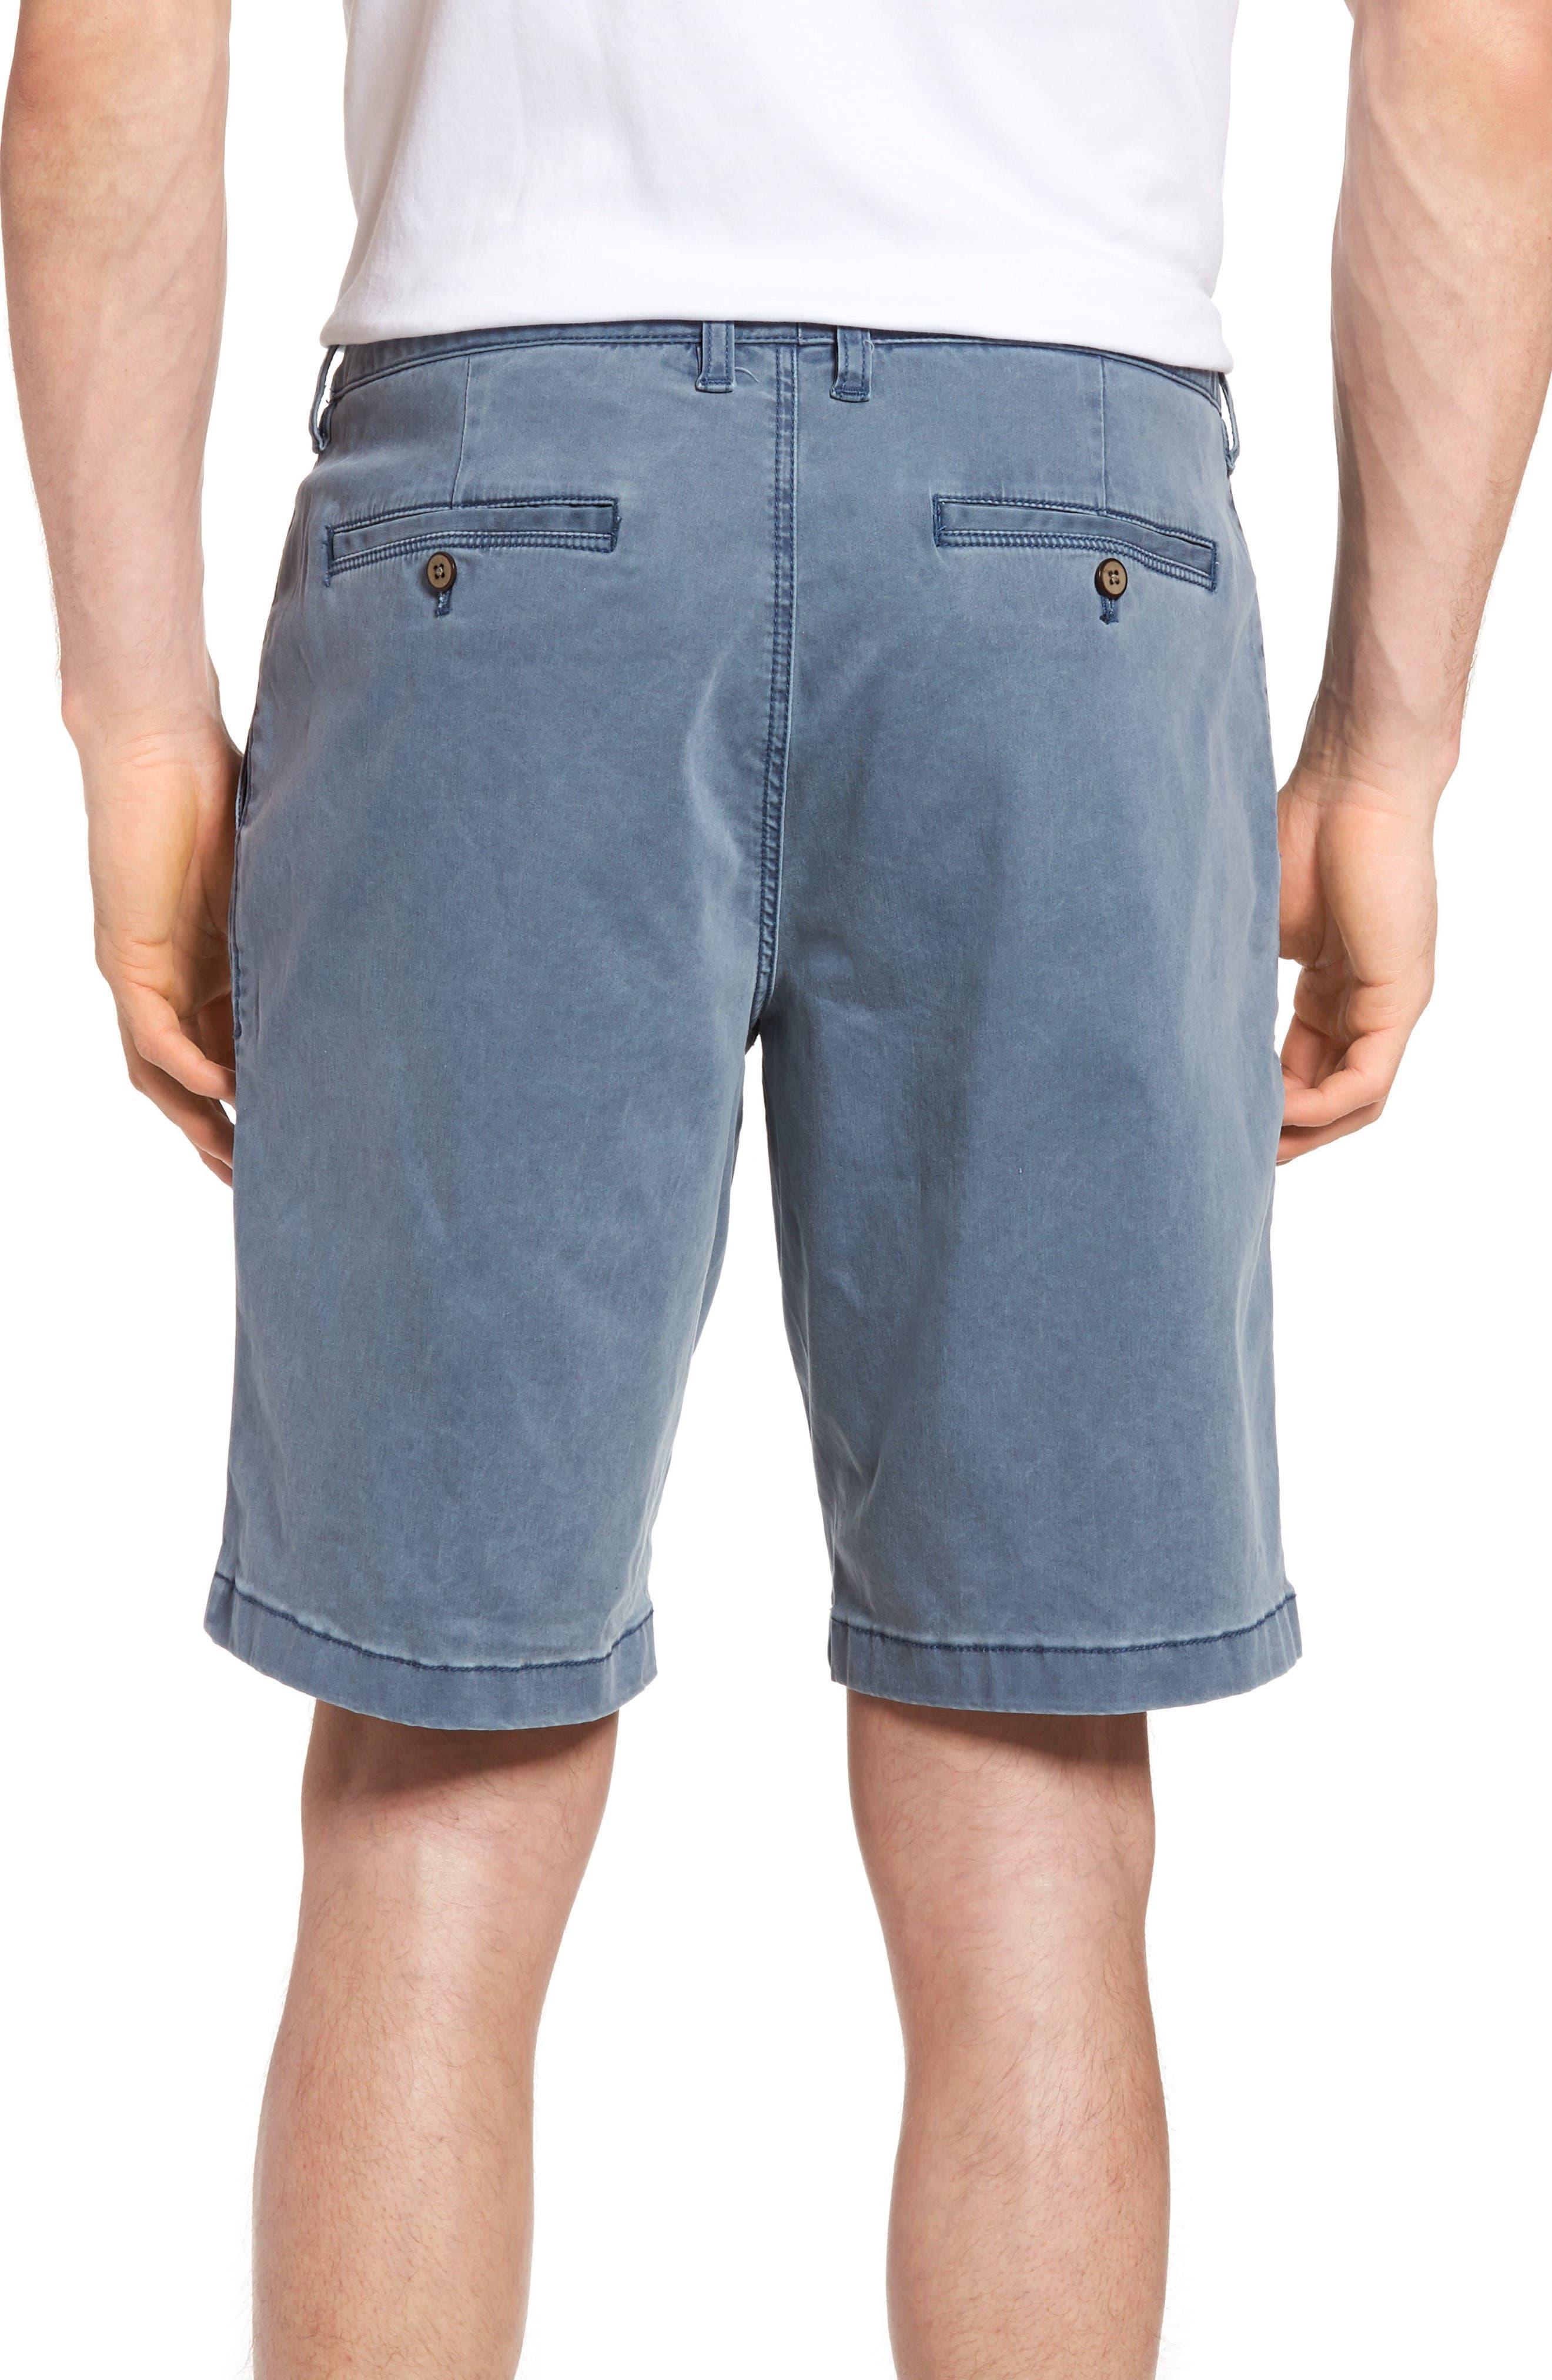 Boracay Chino Shorts,                             Alternate thumbnail 17, color,